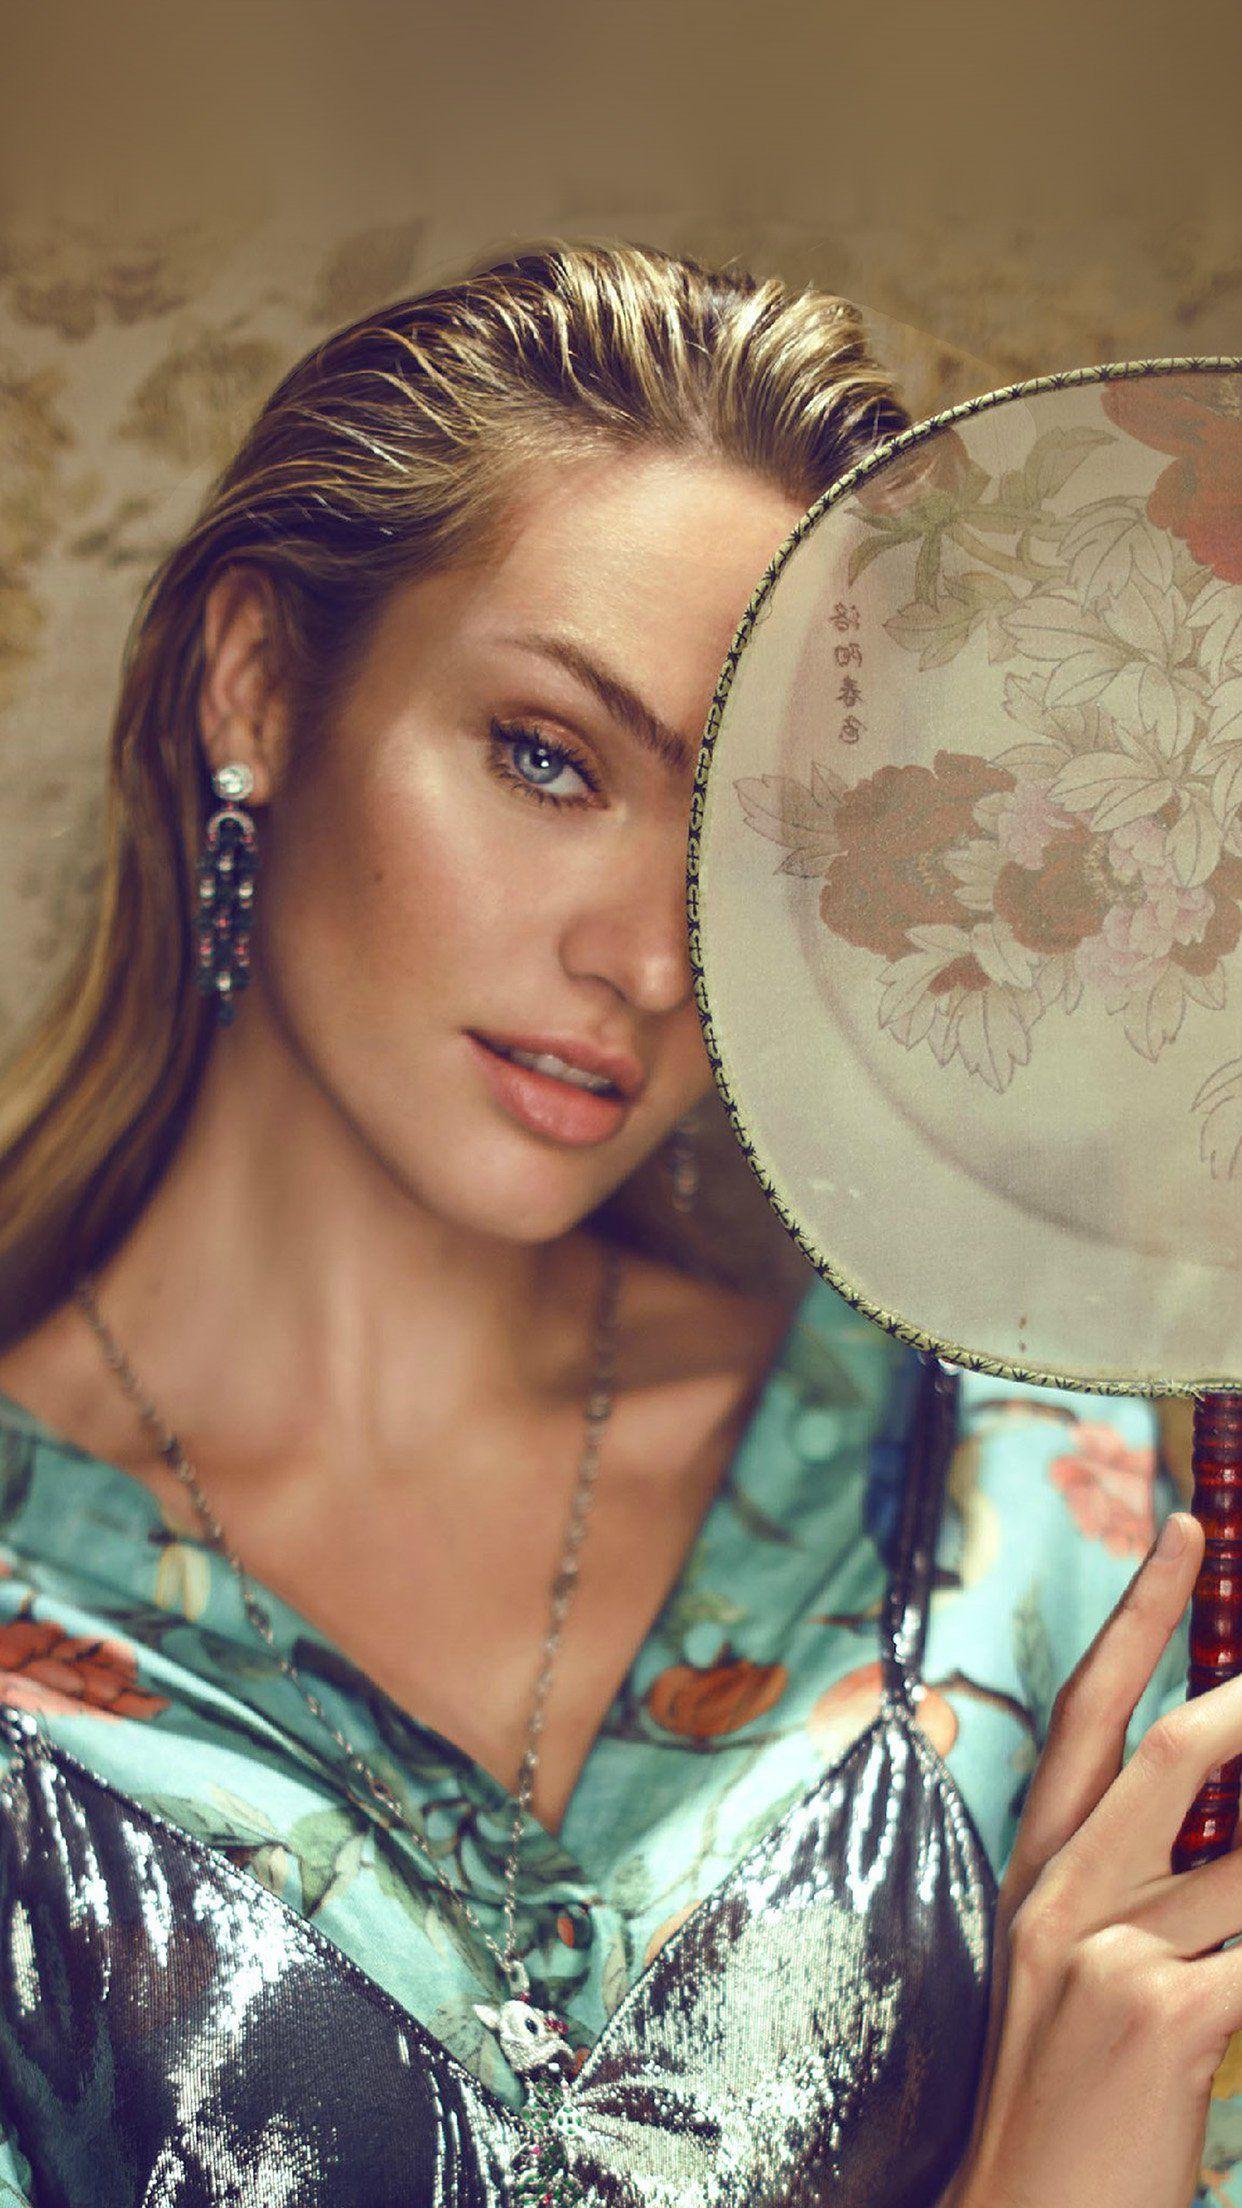 Candice Swanepoel Photoshoot Victoria Secret Girl Iphone 6 Plus Wallpaper Mobile Wallpapers Victoria Secret Girls Victoria Secret Wallpaper Photoshoot